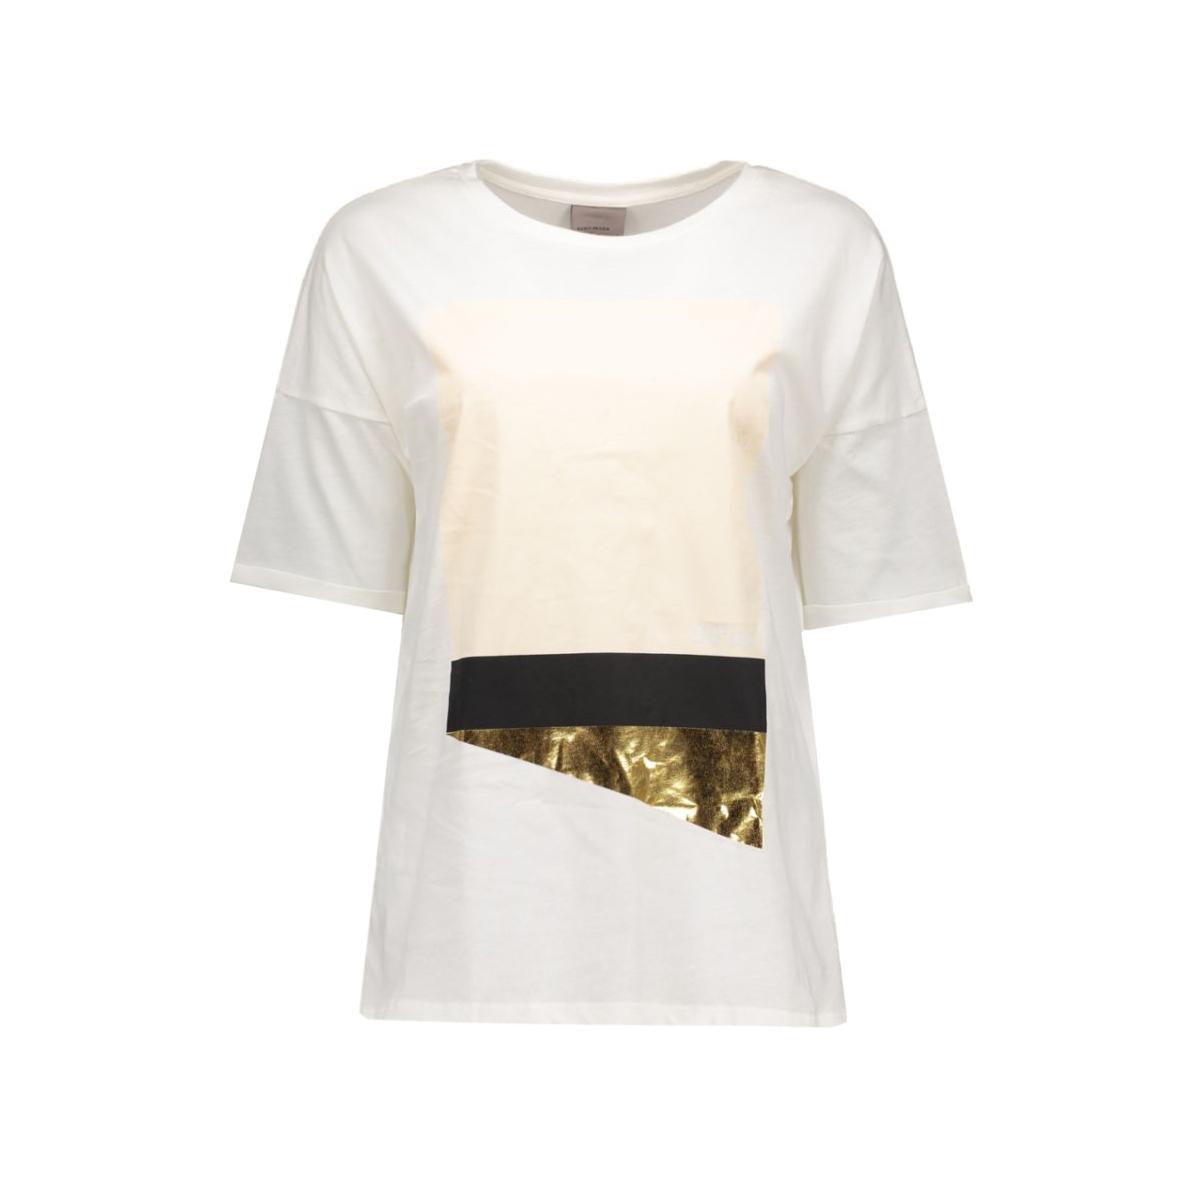 vmlulu printed s/s t-shirt e10 10168739 vero moda t-shirt snow white/907